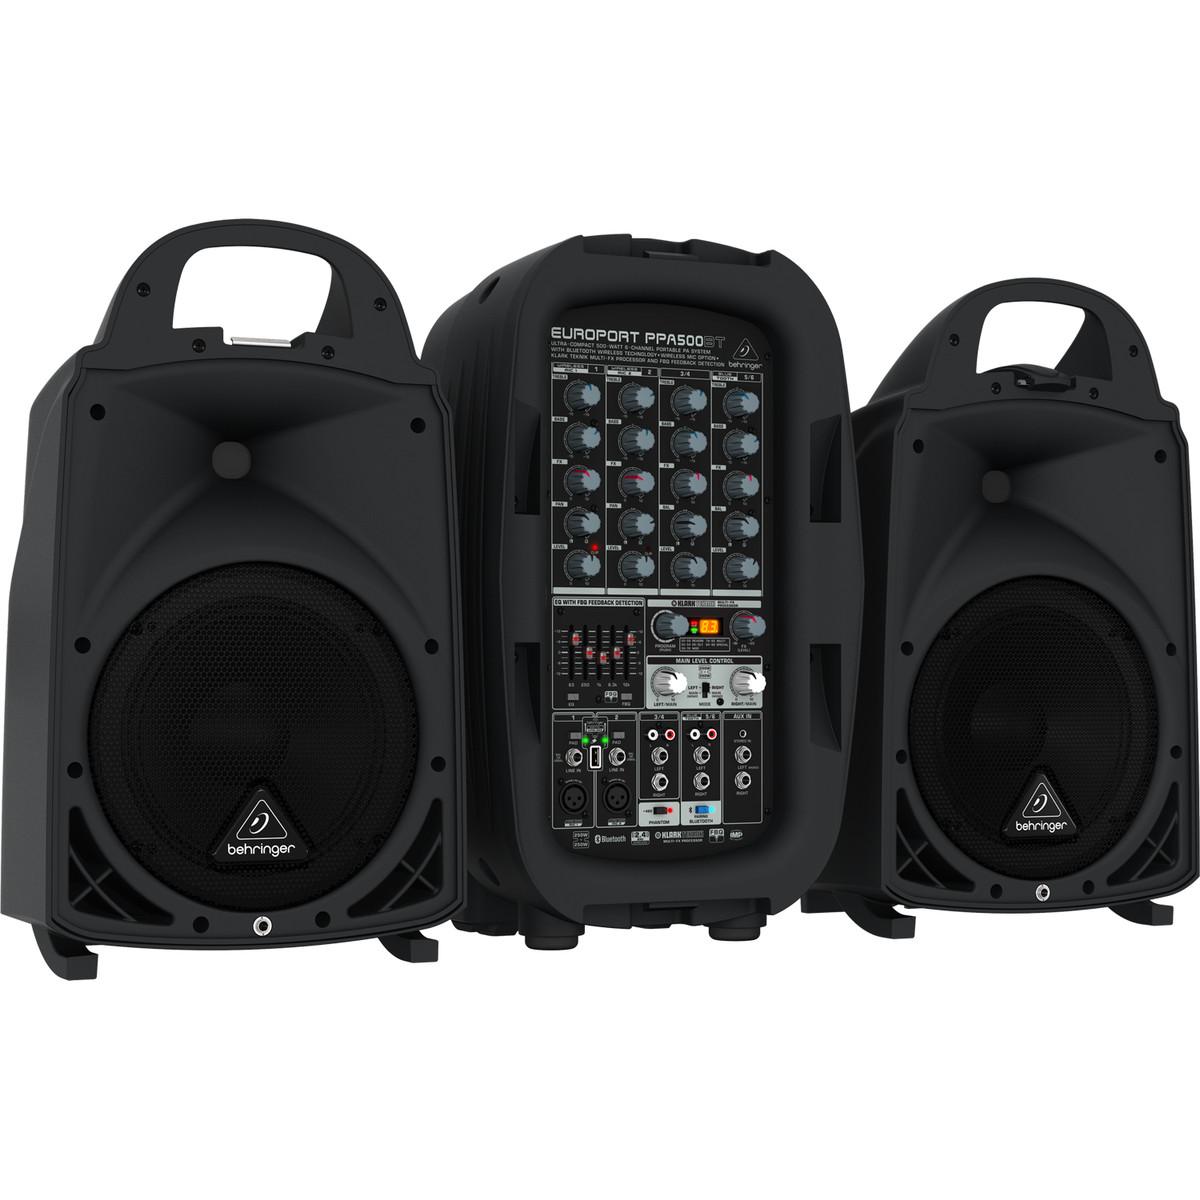 behringer europort ppa500bt 6 channel portable pa system at gear4music. Black Bedroom Furniture Sets. Home Design Ideas